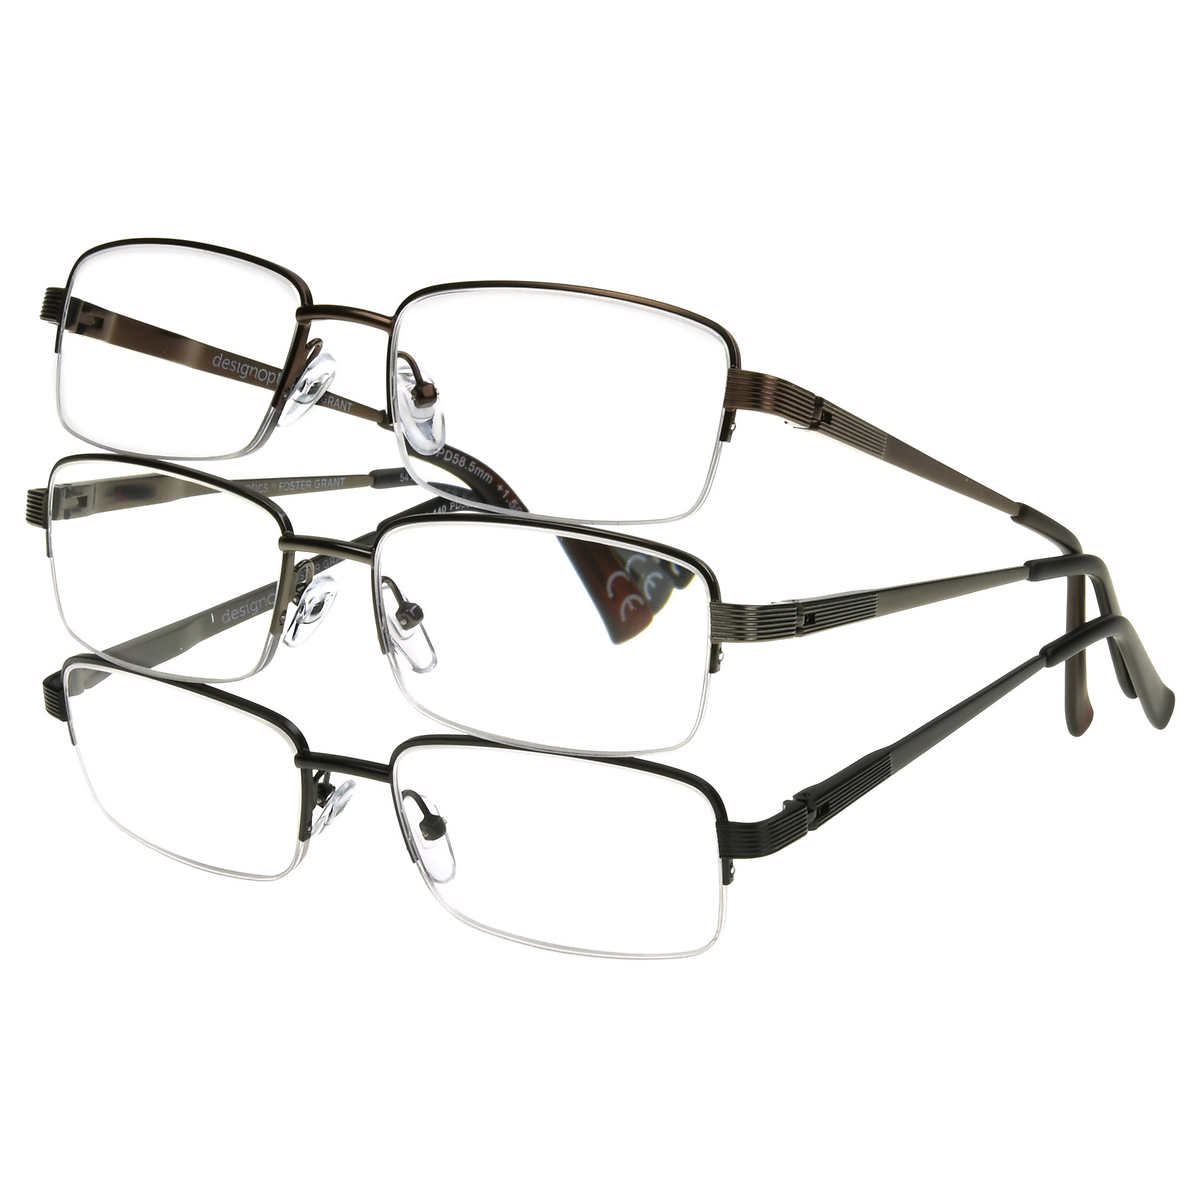 2588b91355dd Design Optics By Foster Grant, Semi-rimless Metal Reading Glasses, 3 ...